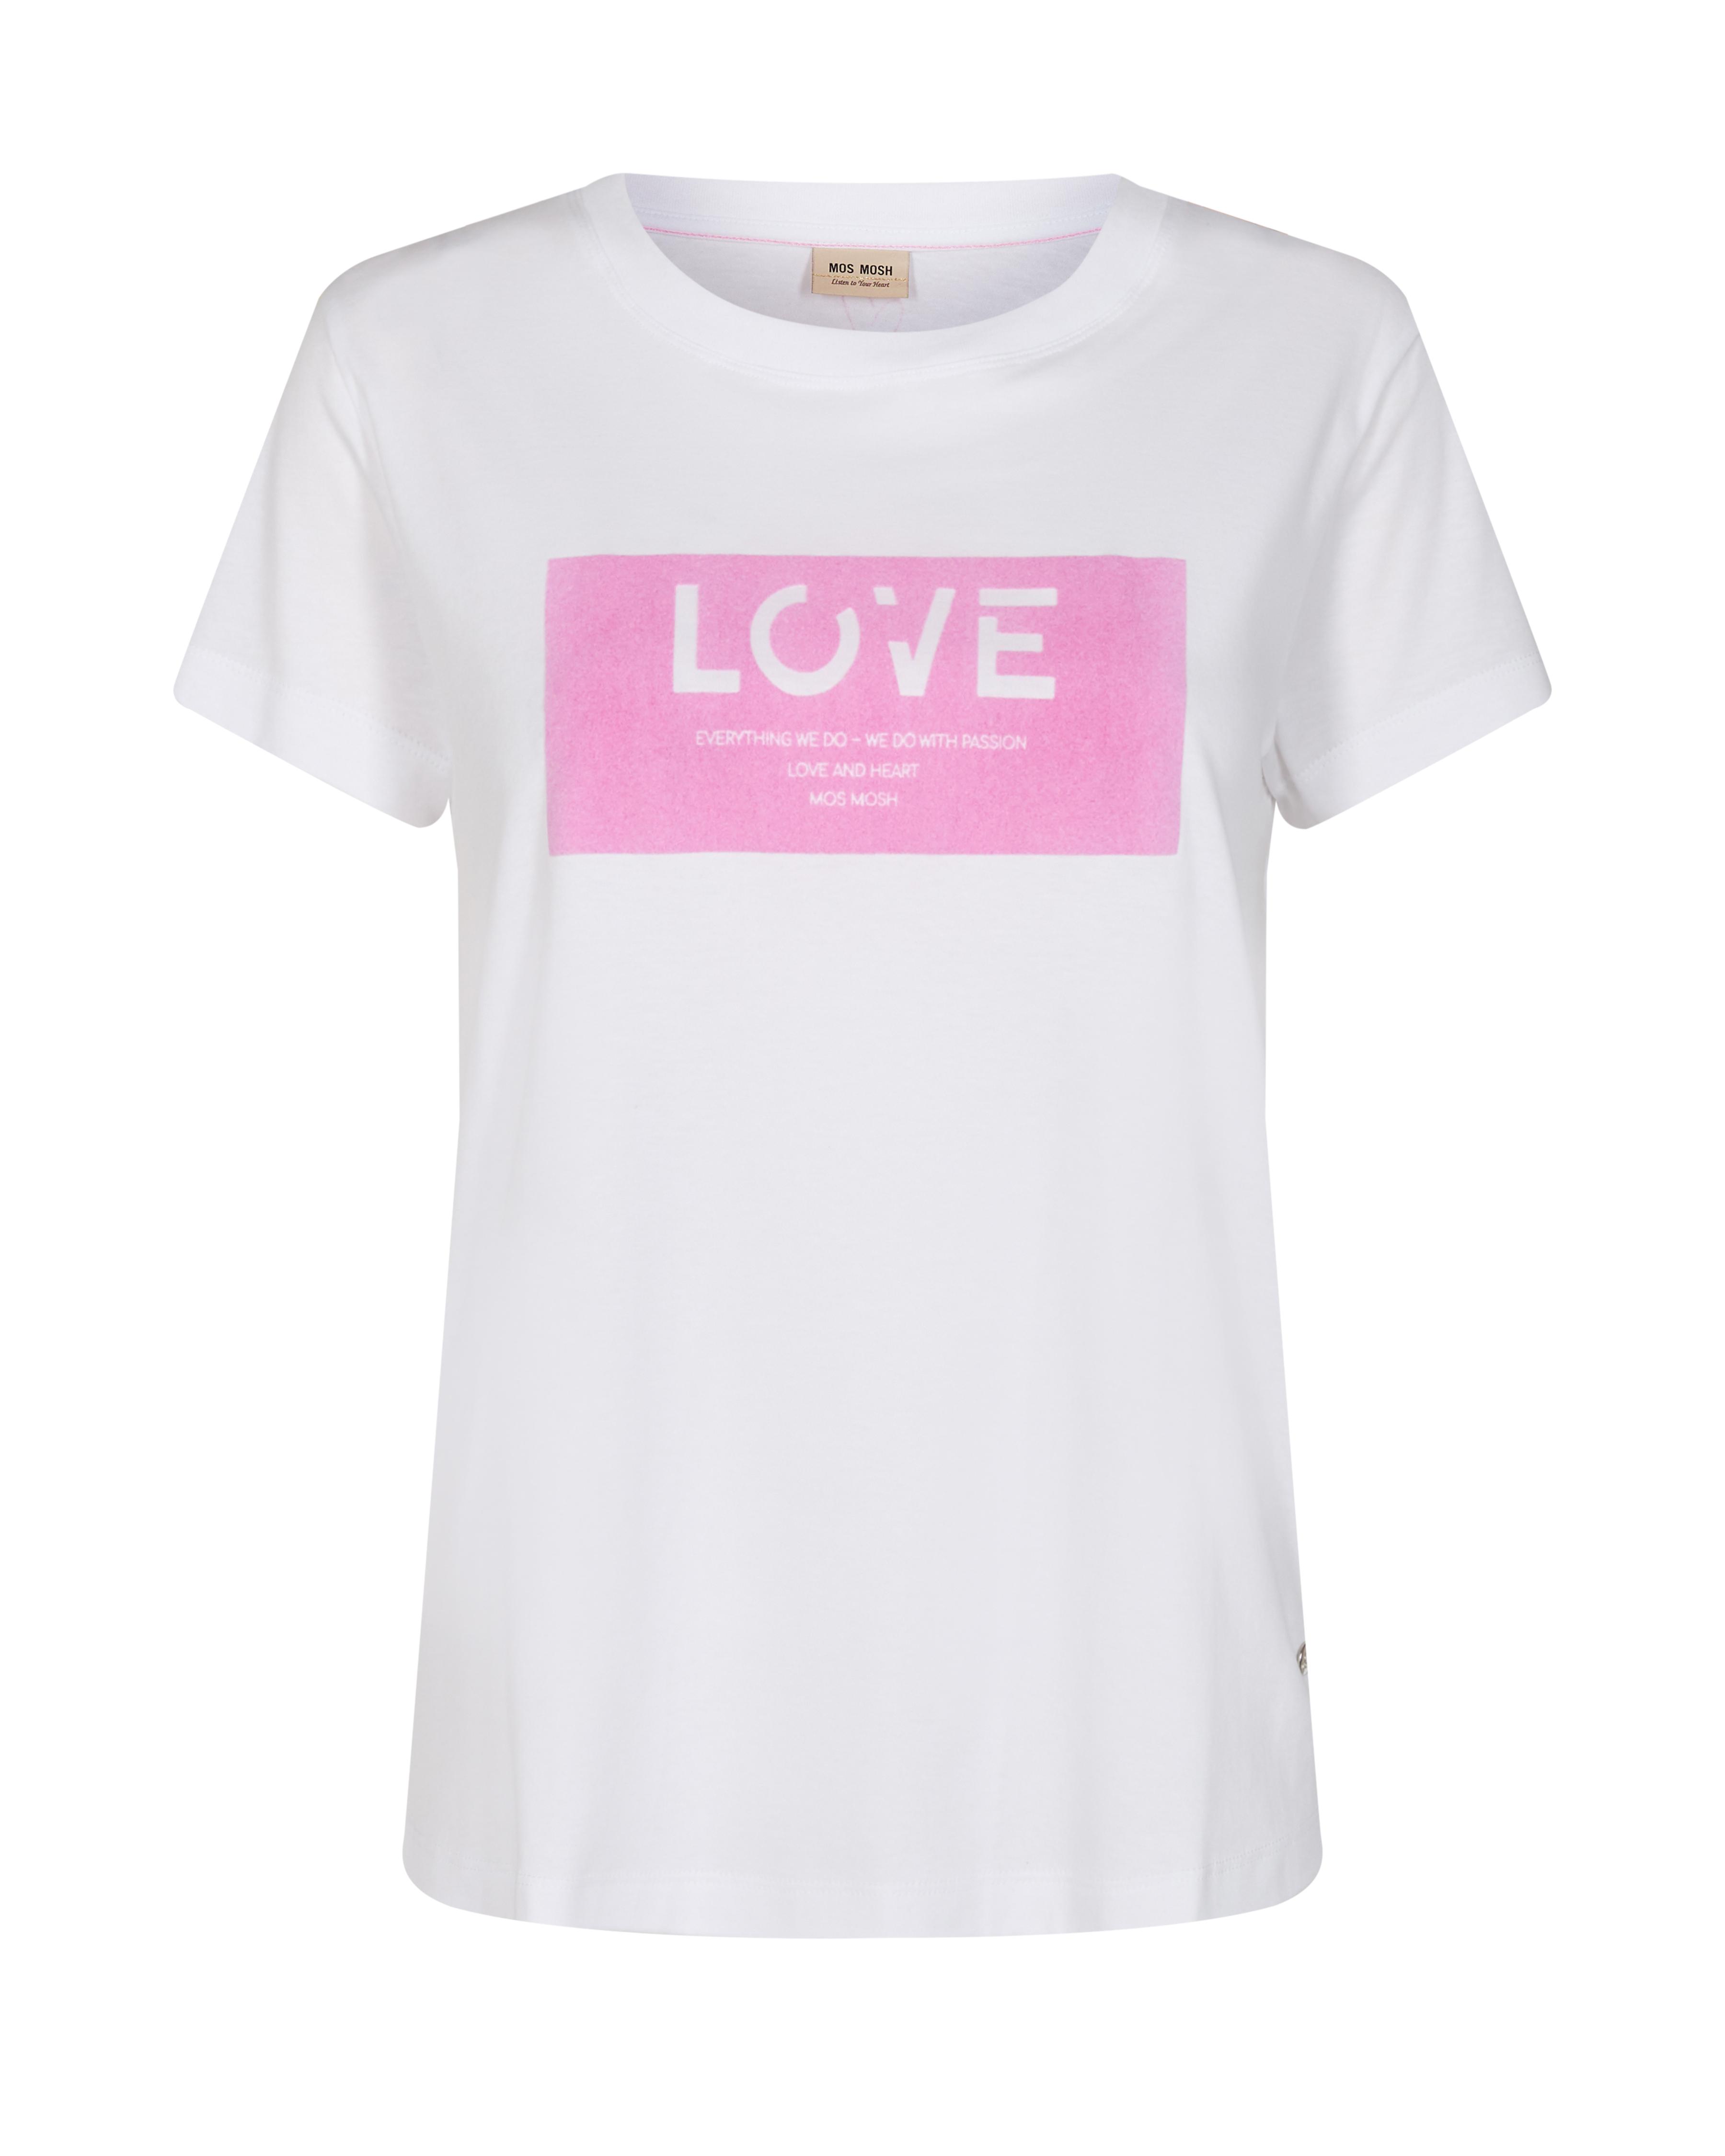 Mos Mosh Chérie O-SS t-shirt, bubble pink, large